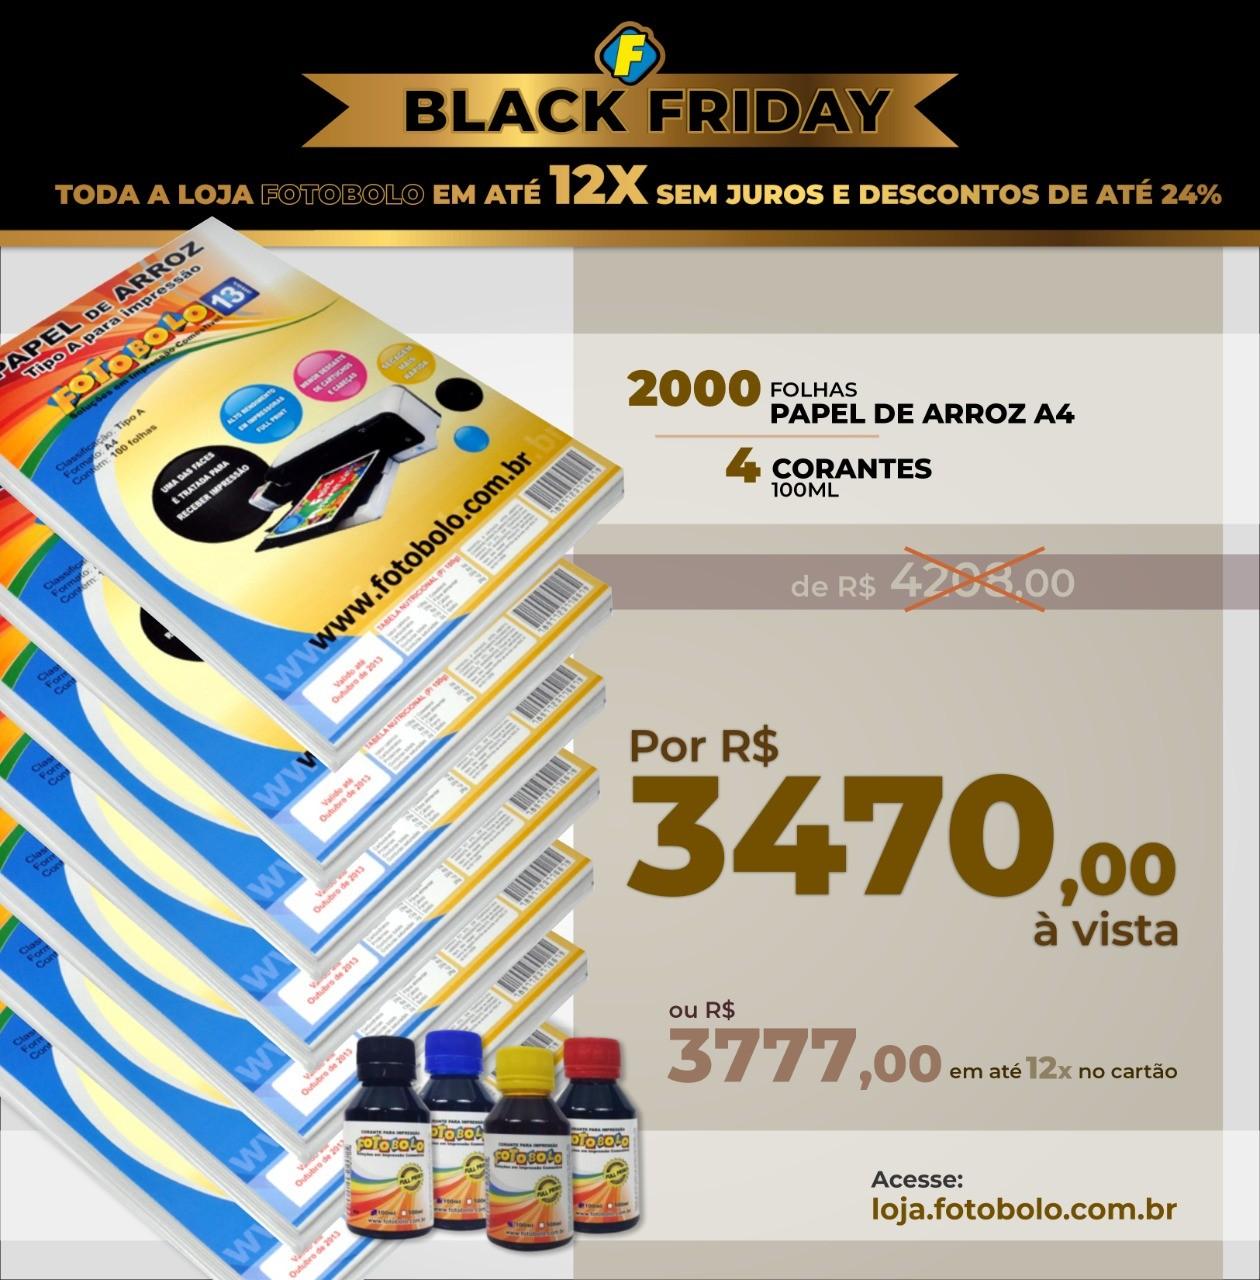 COMBO BLACK FRIDAY - 2000 Papéis Arroz A4 TIPO A + 1 Kit de Corantes 100ml ( 4 frascos + 4 Bicos)